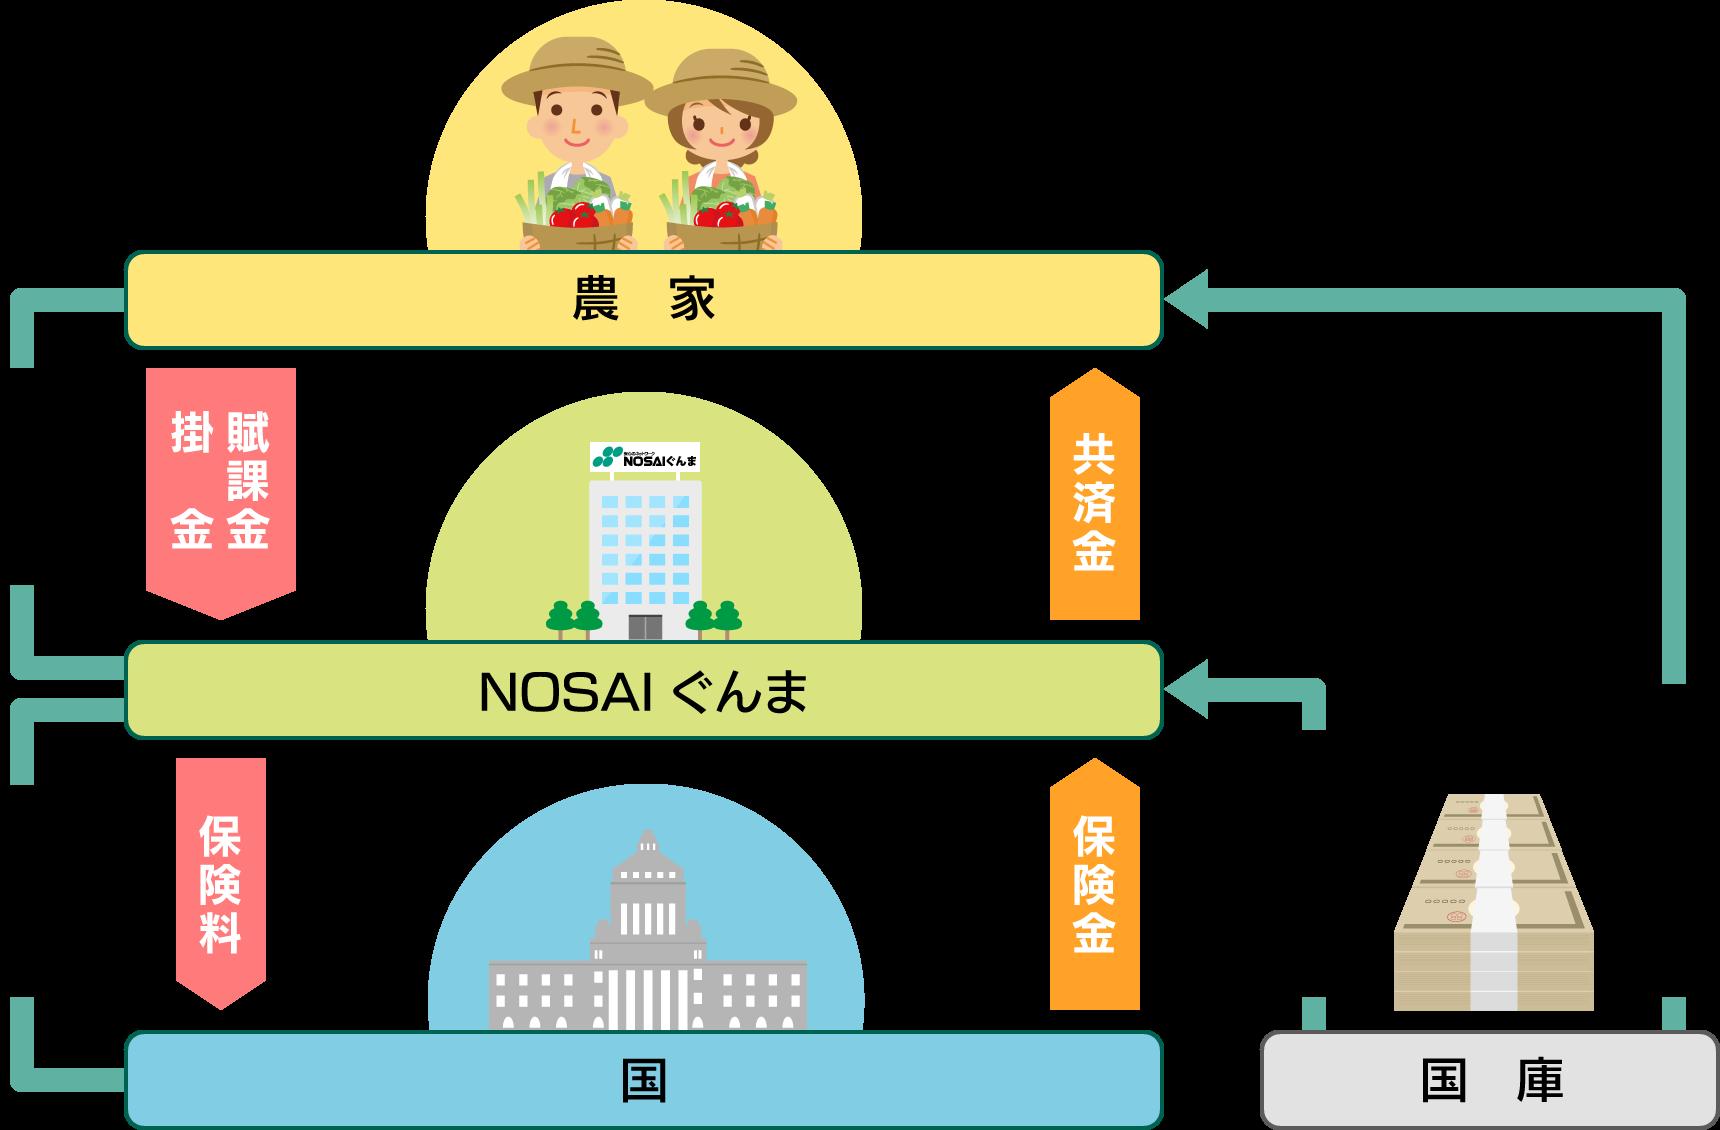 NOSAIの機構図